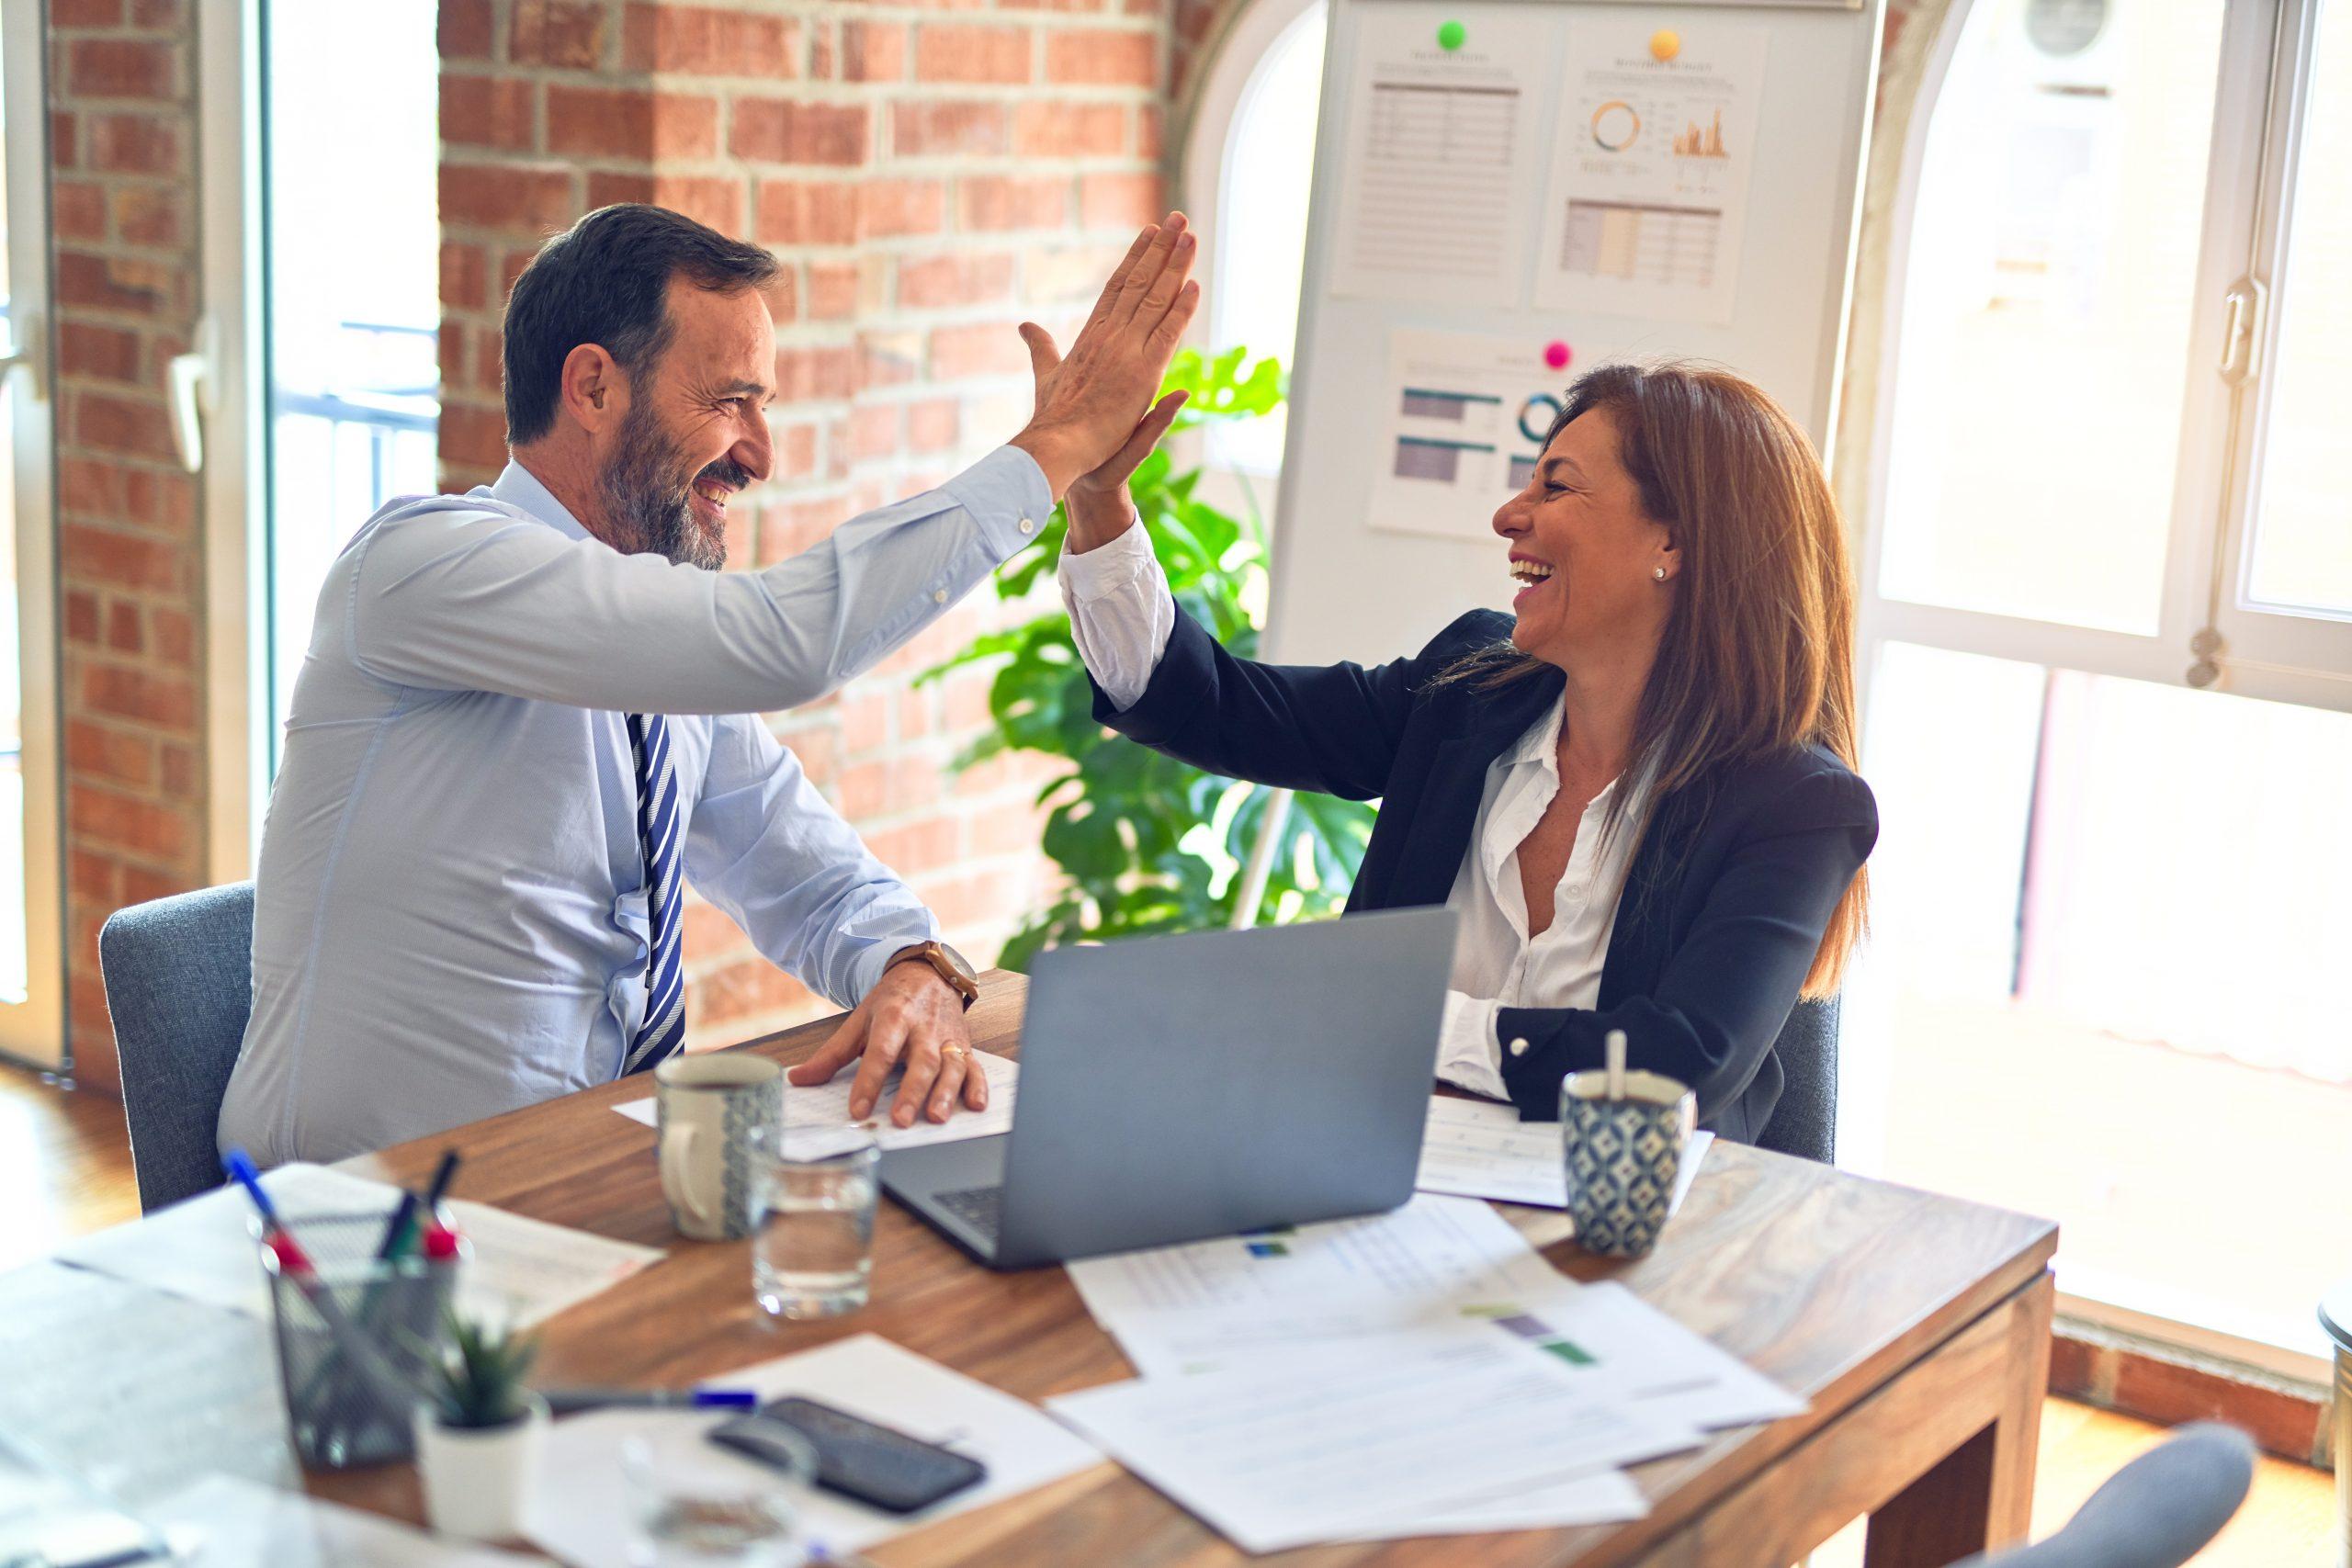 startup-corporate collaboration - team work motivation